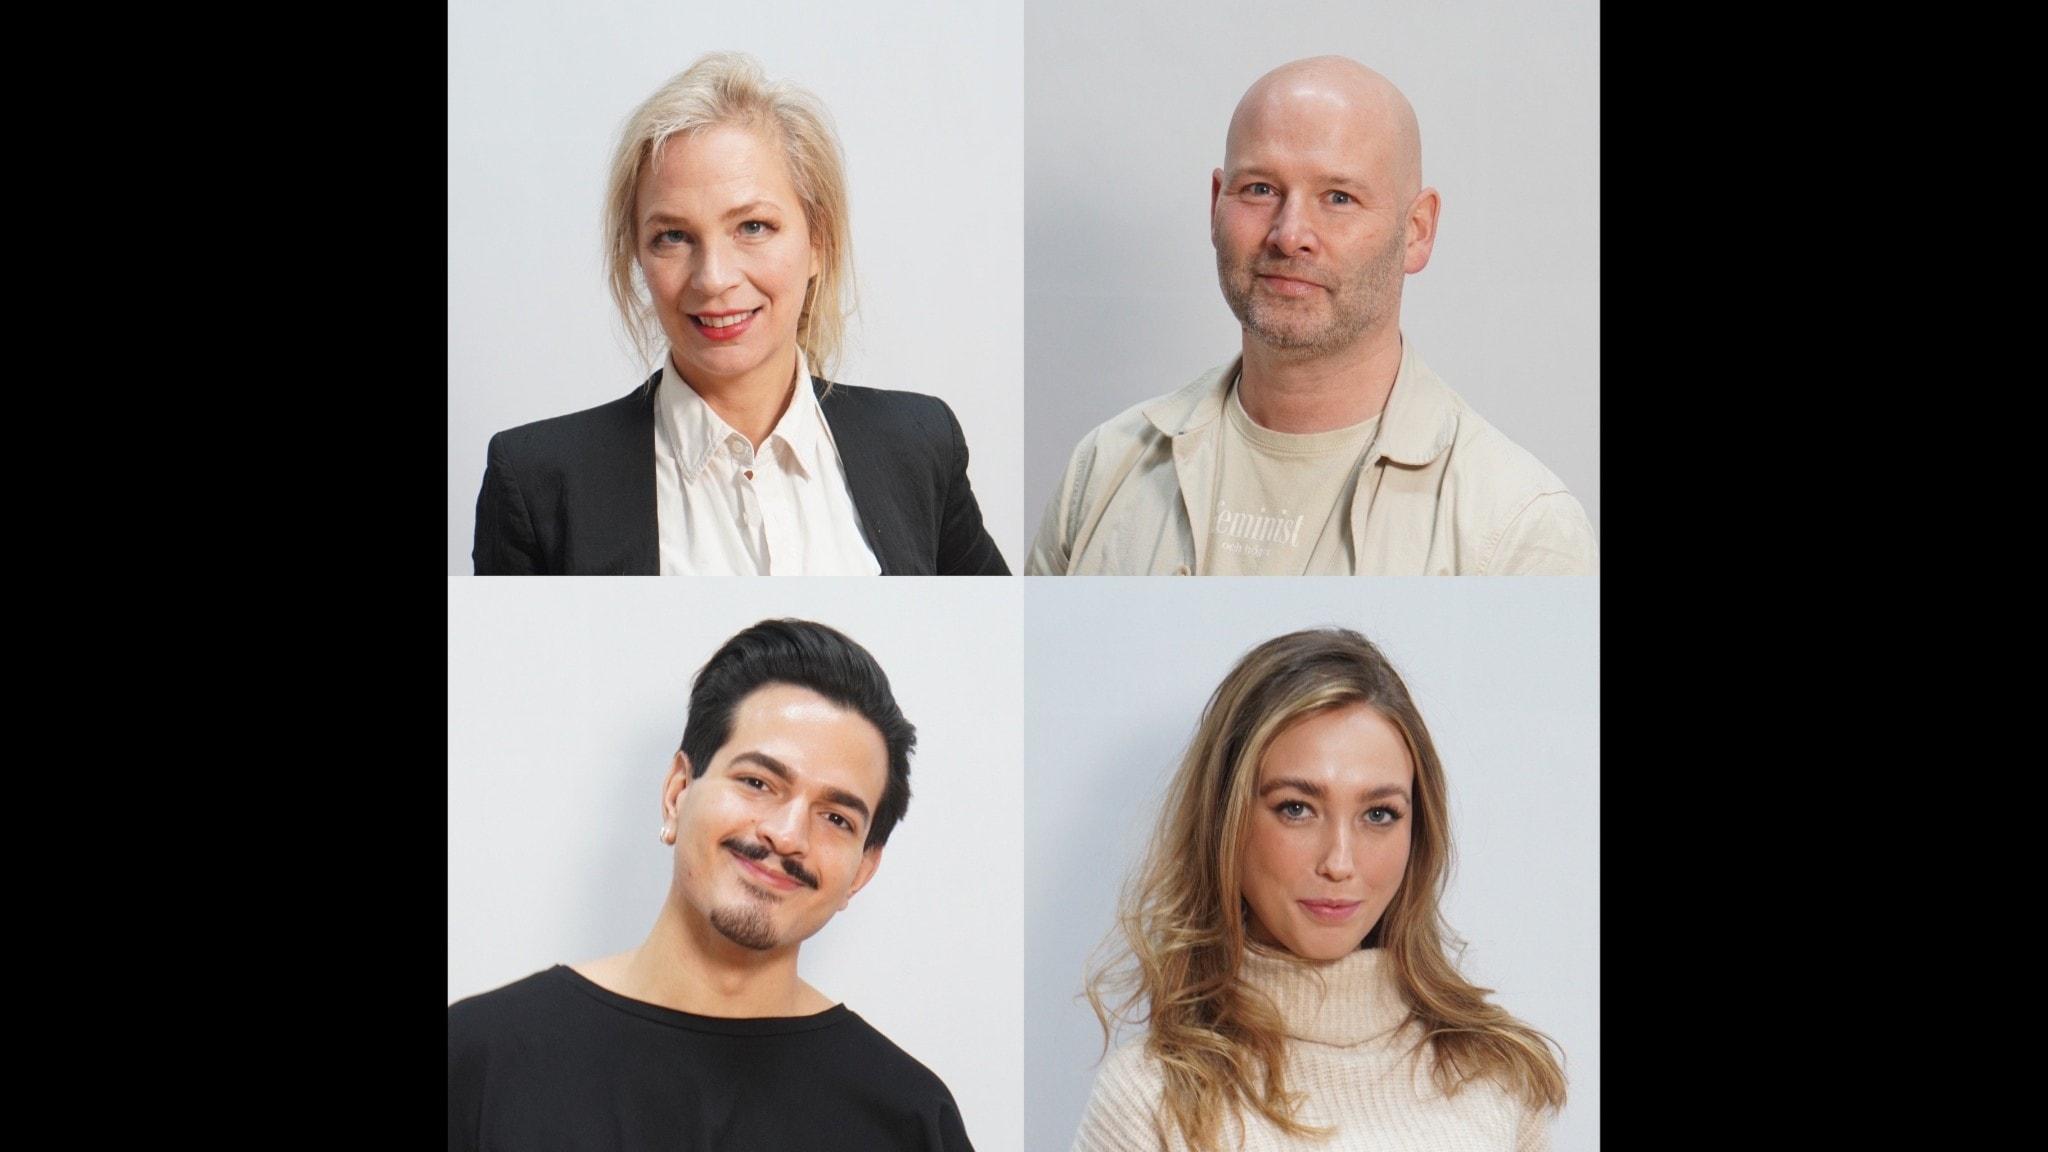 Jenny Lindahl, Martin Borgs, Alex Letix & Olivia Johansson Berntsson